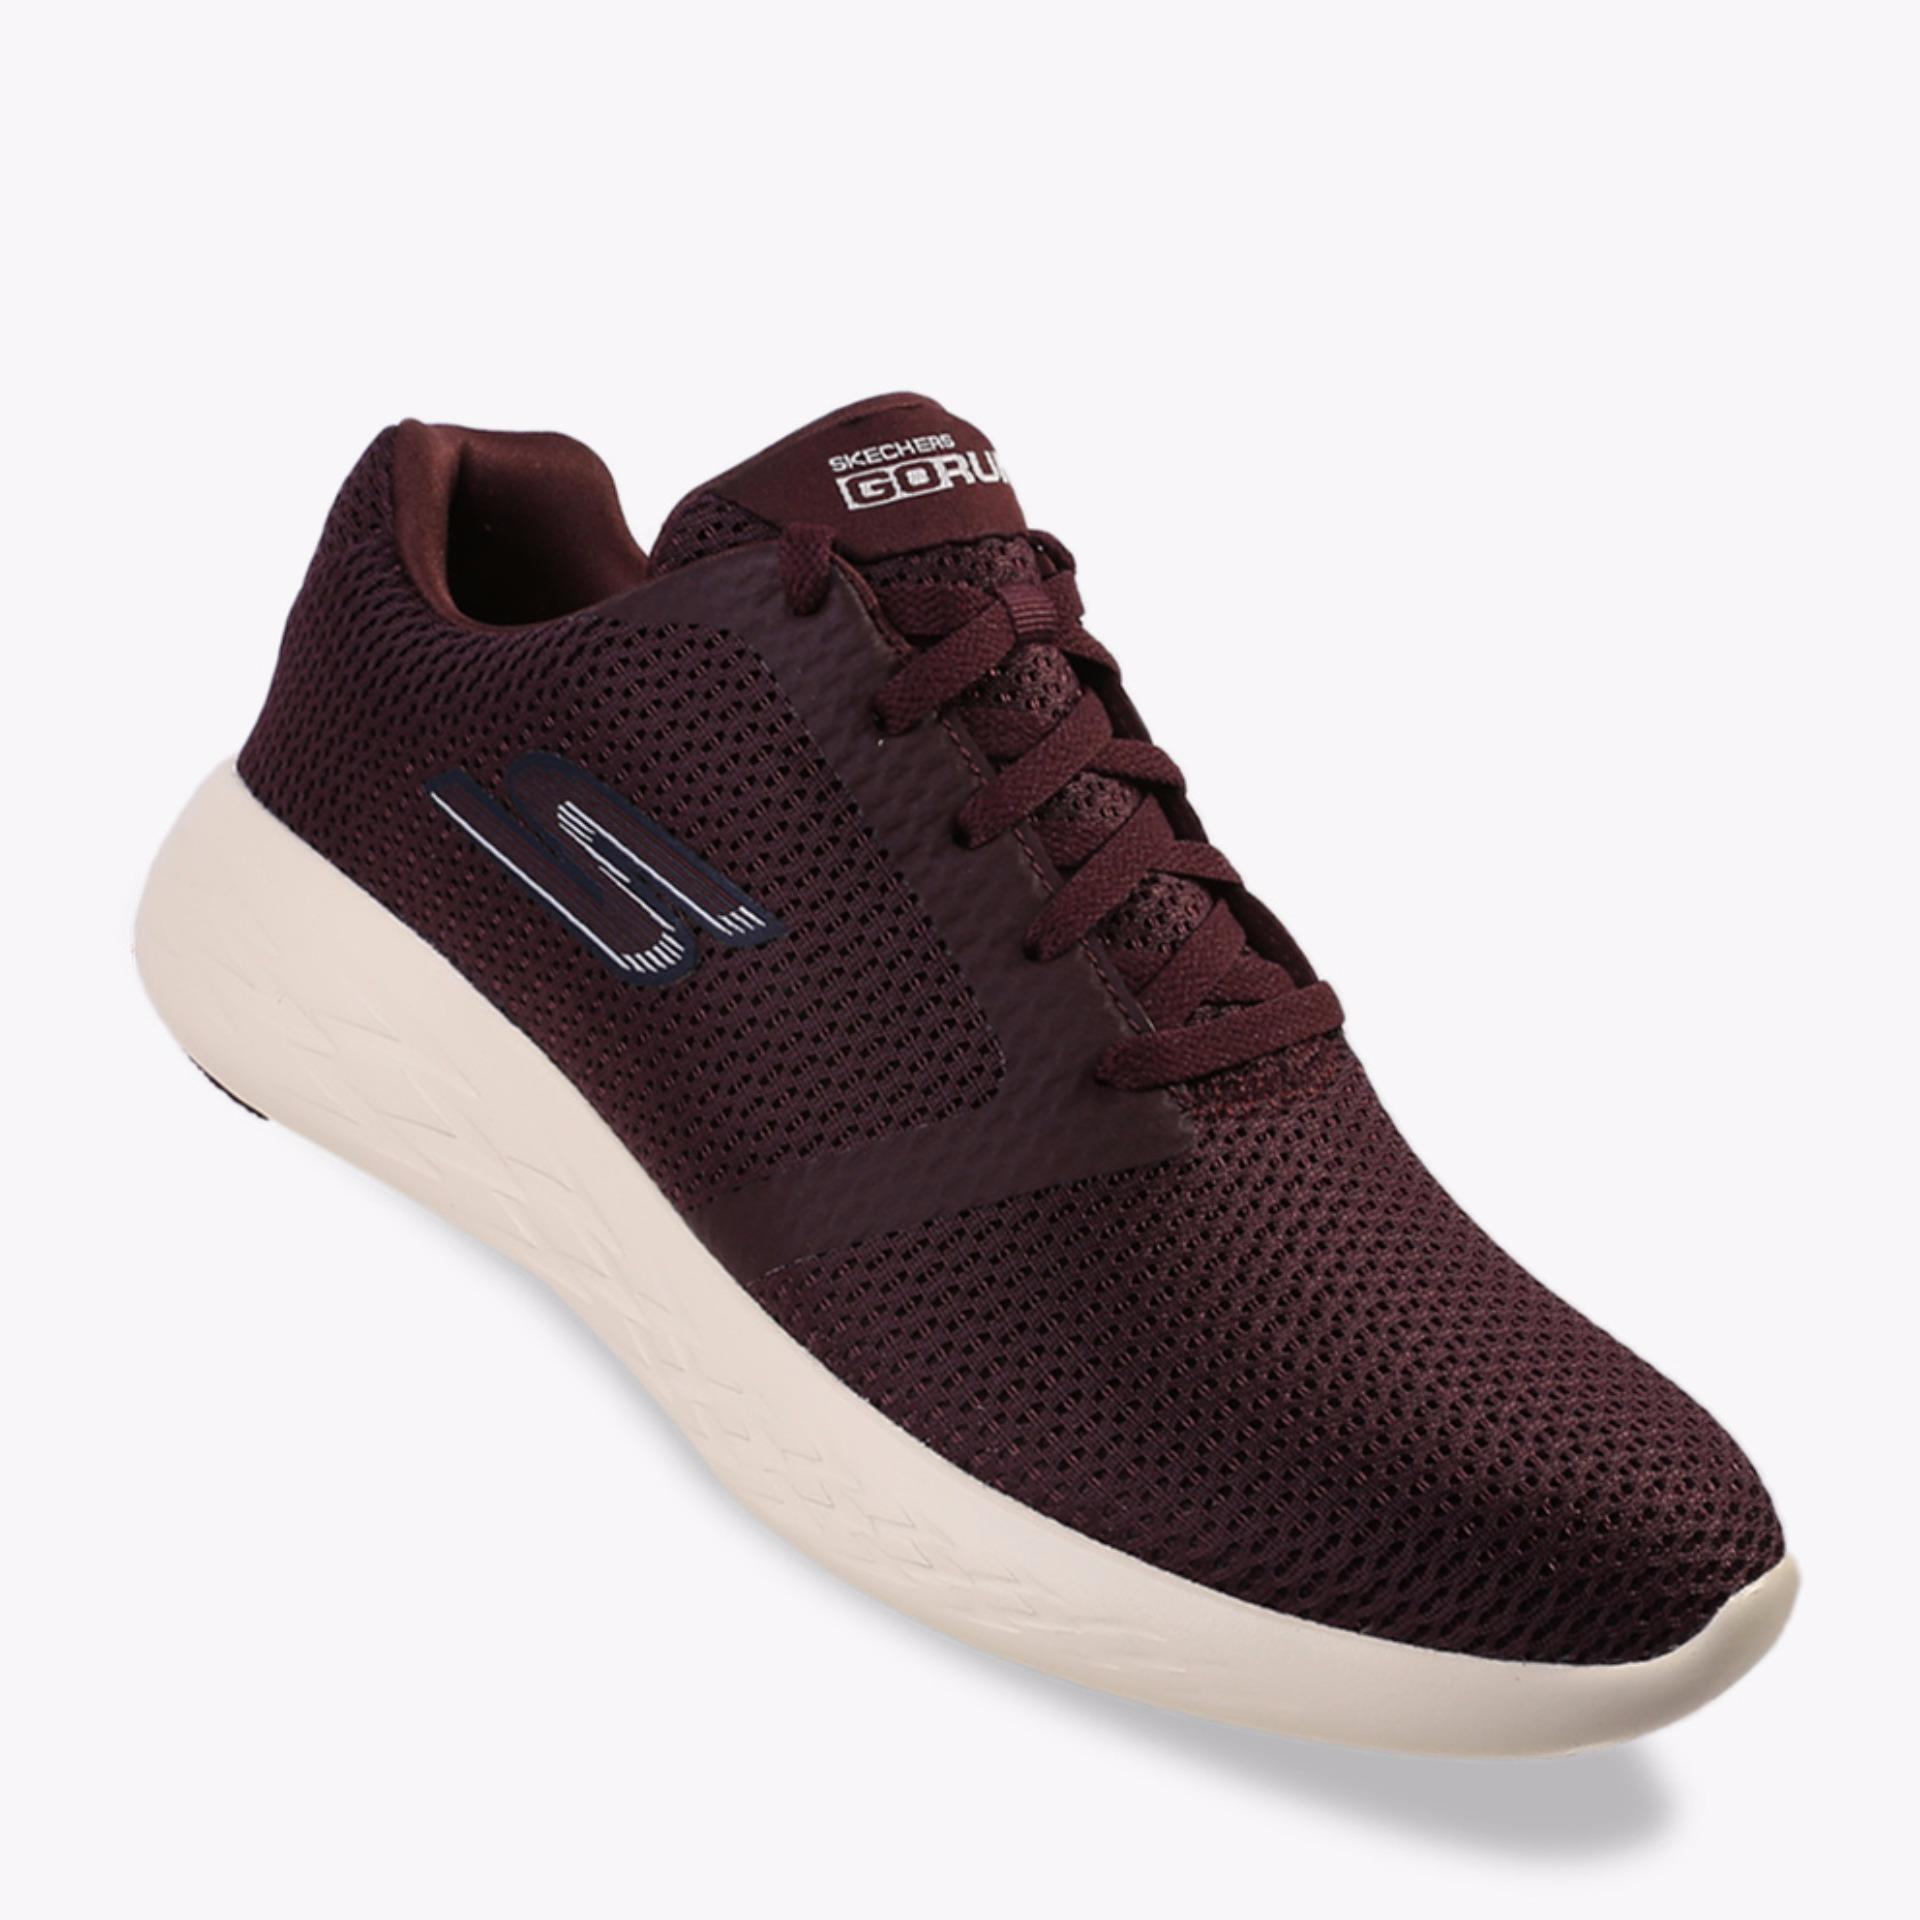 Diskon Besarskechers Gorun 600 Refine Men S Running Shoes Maroon